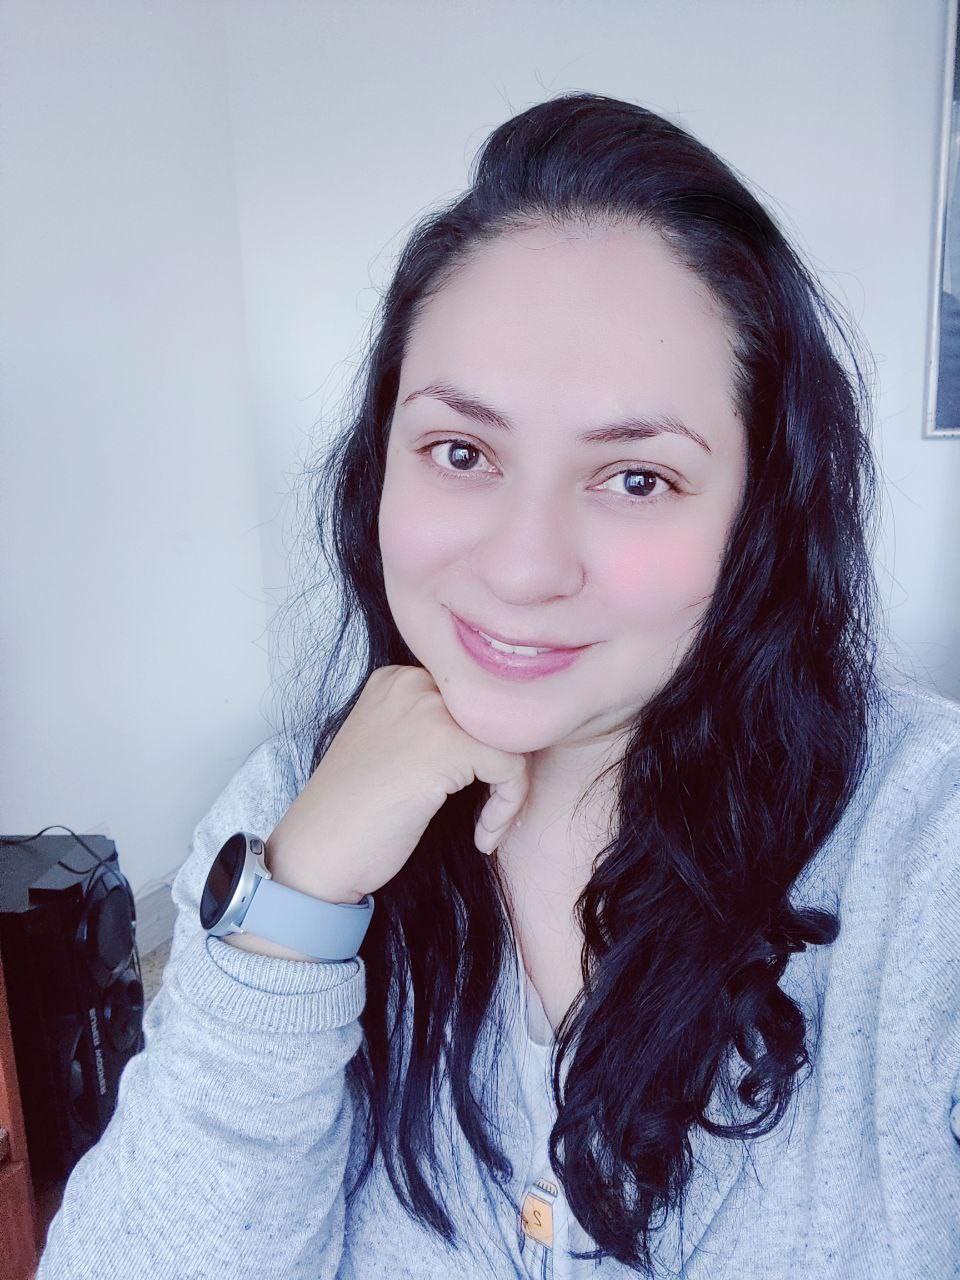 Juranny Andrea Muriel Londoño